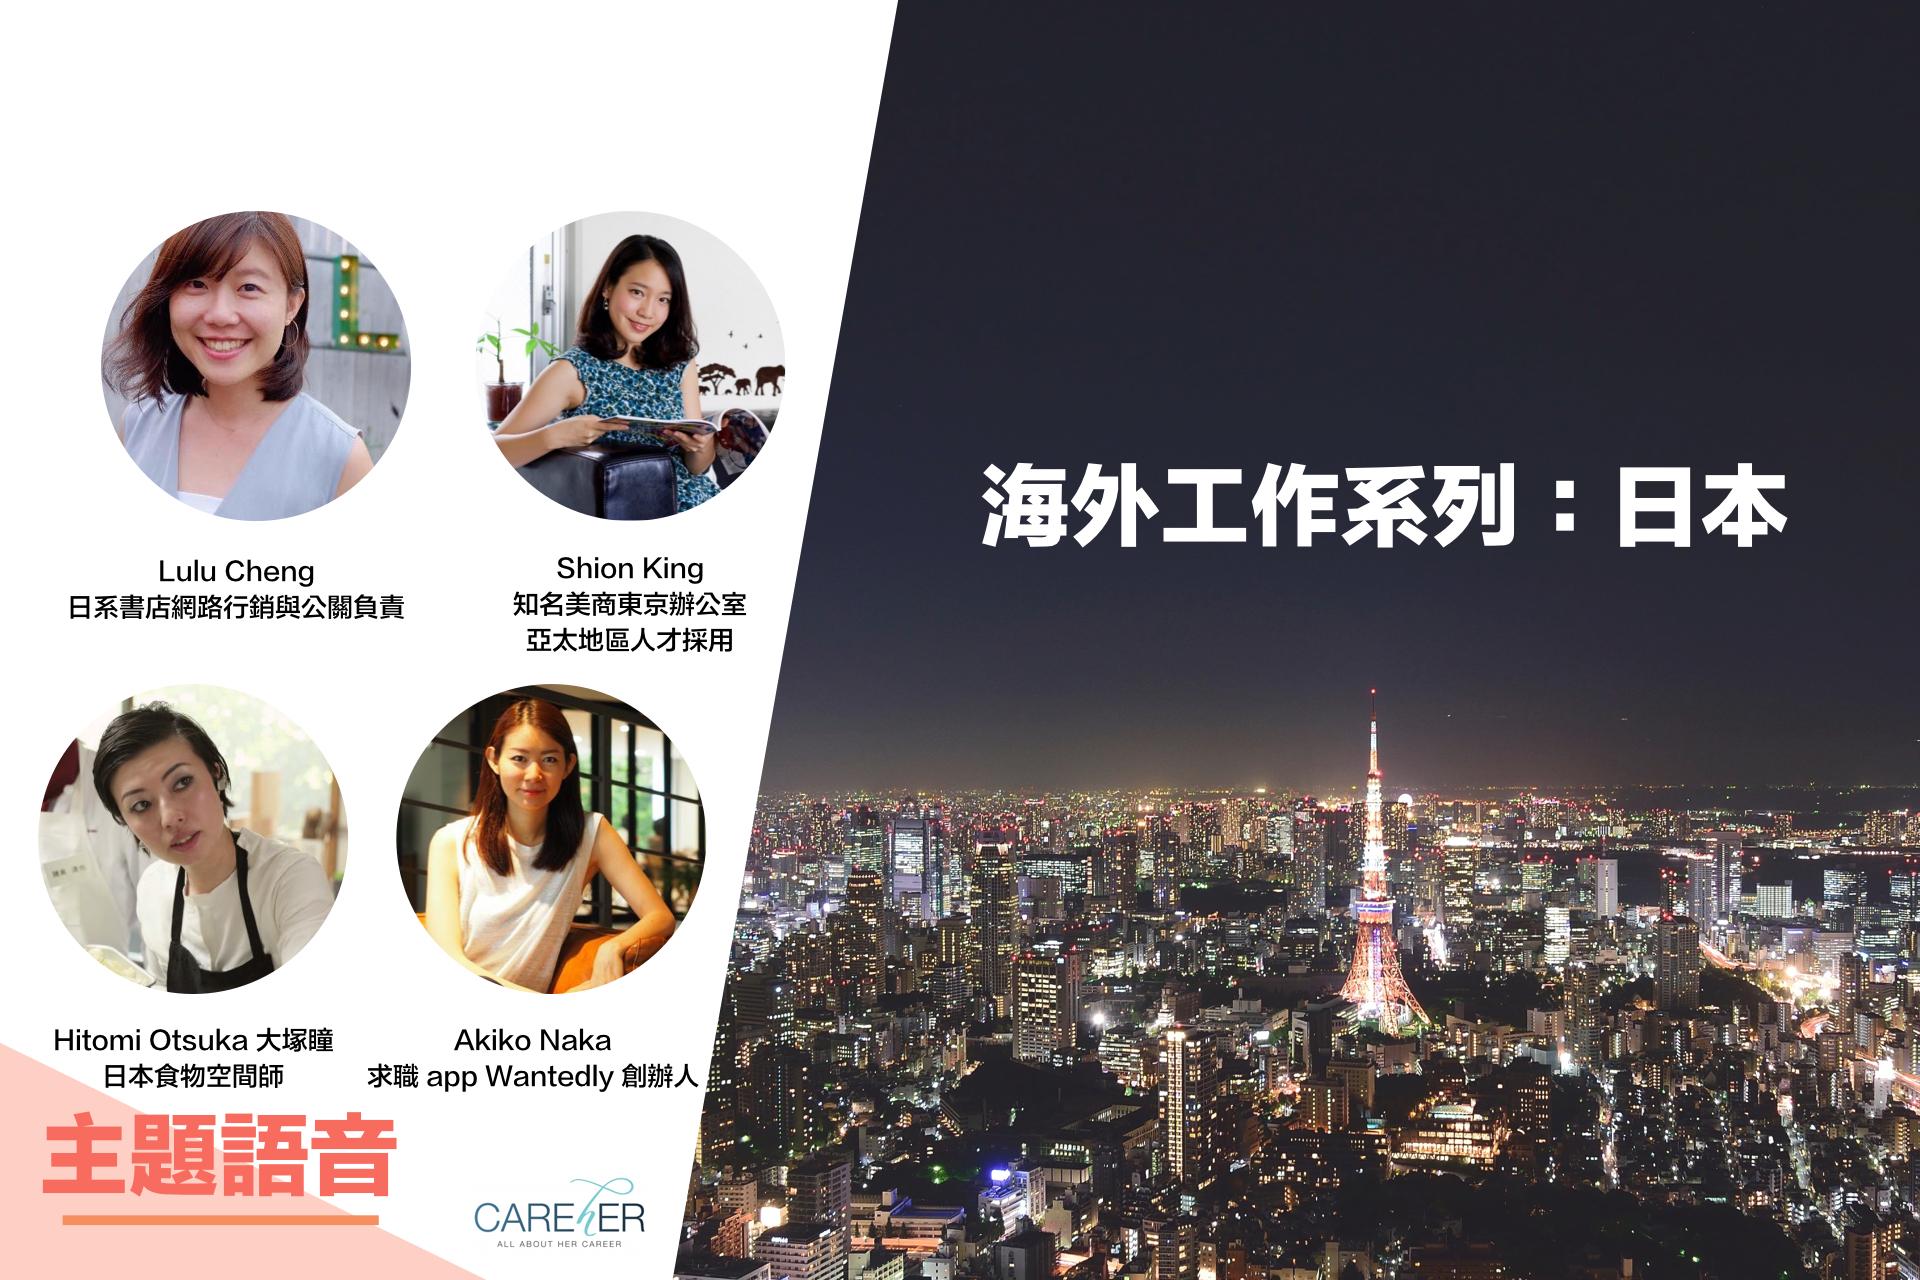 【CAREhER 主題語音】她們,都在日本工作:招募專家、求職 app 創辦人、個人工作者、行銷與公關領域